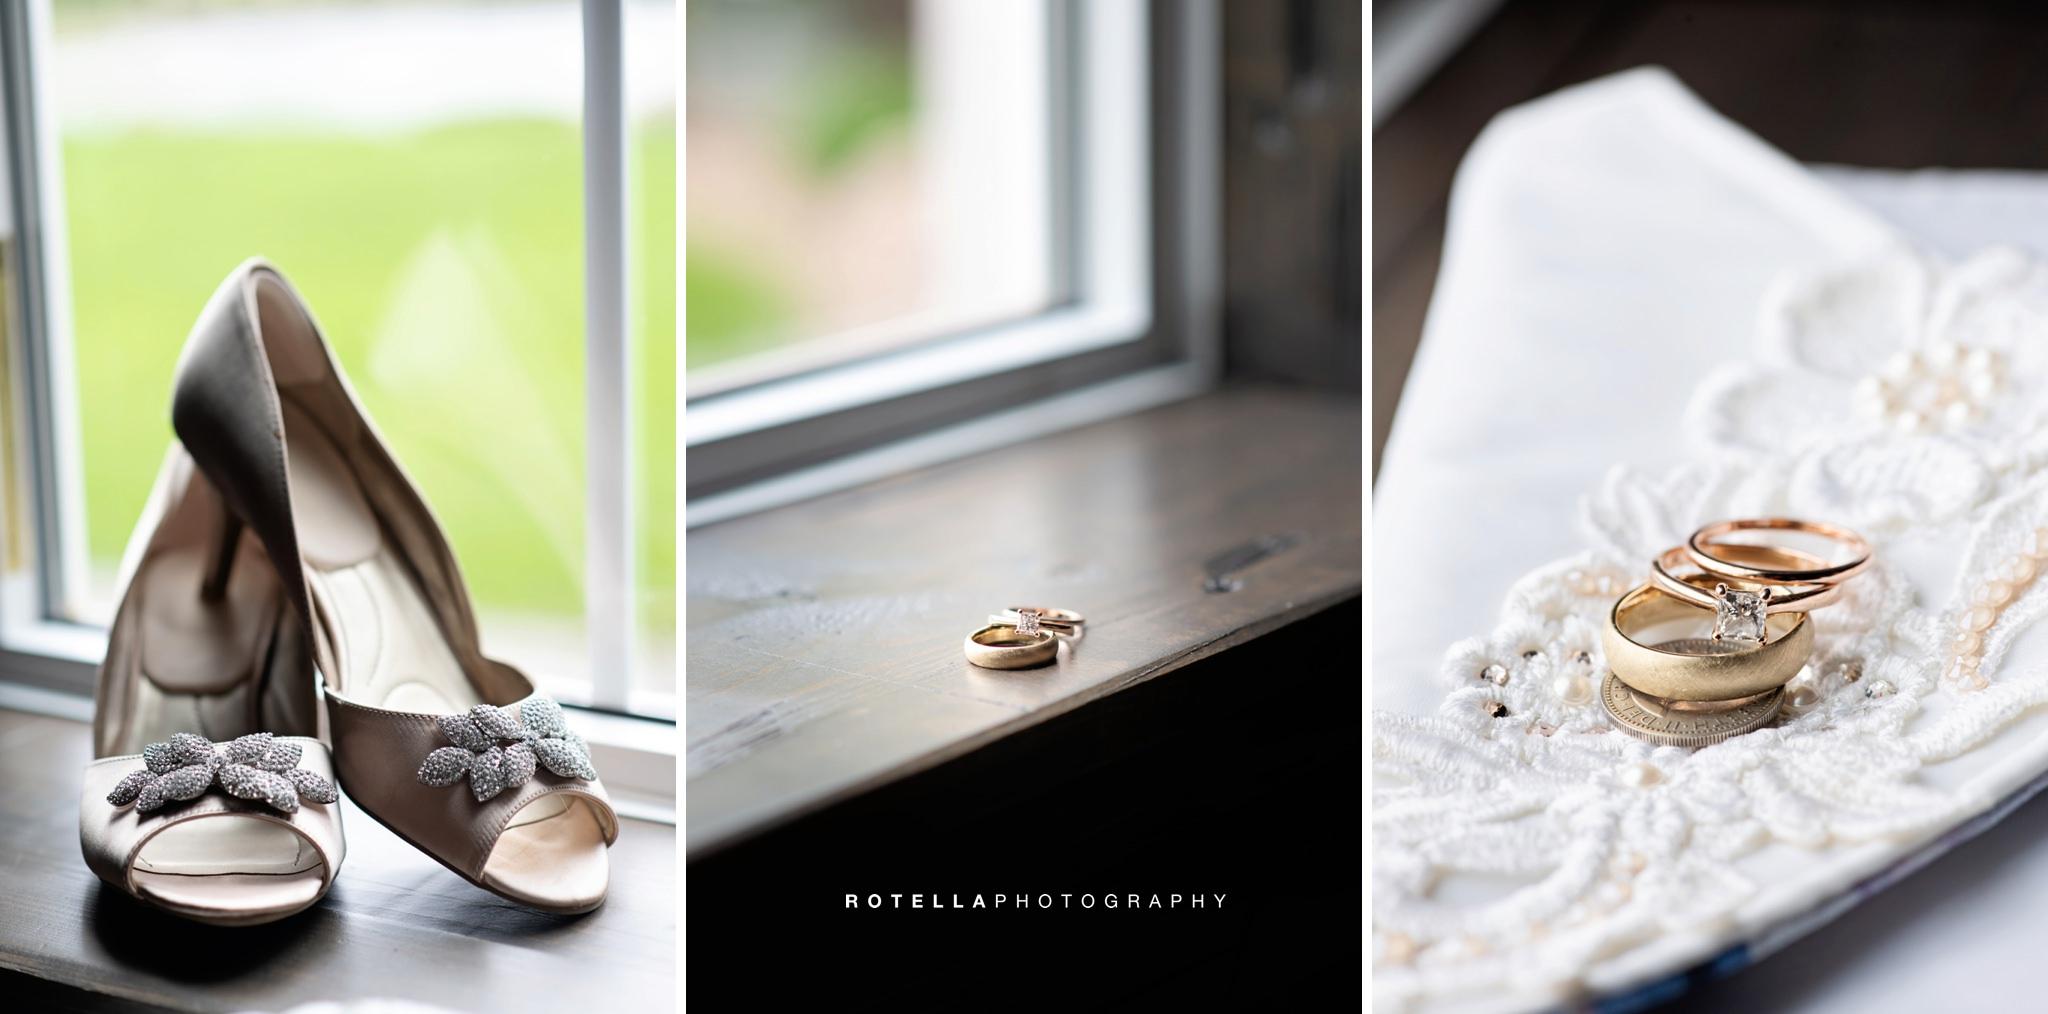 Cassie-Corbin-Wedding-05-25-2019-Rotella-Photography-PREV-97-11_BLOG.jpg